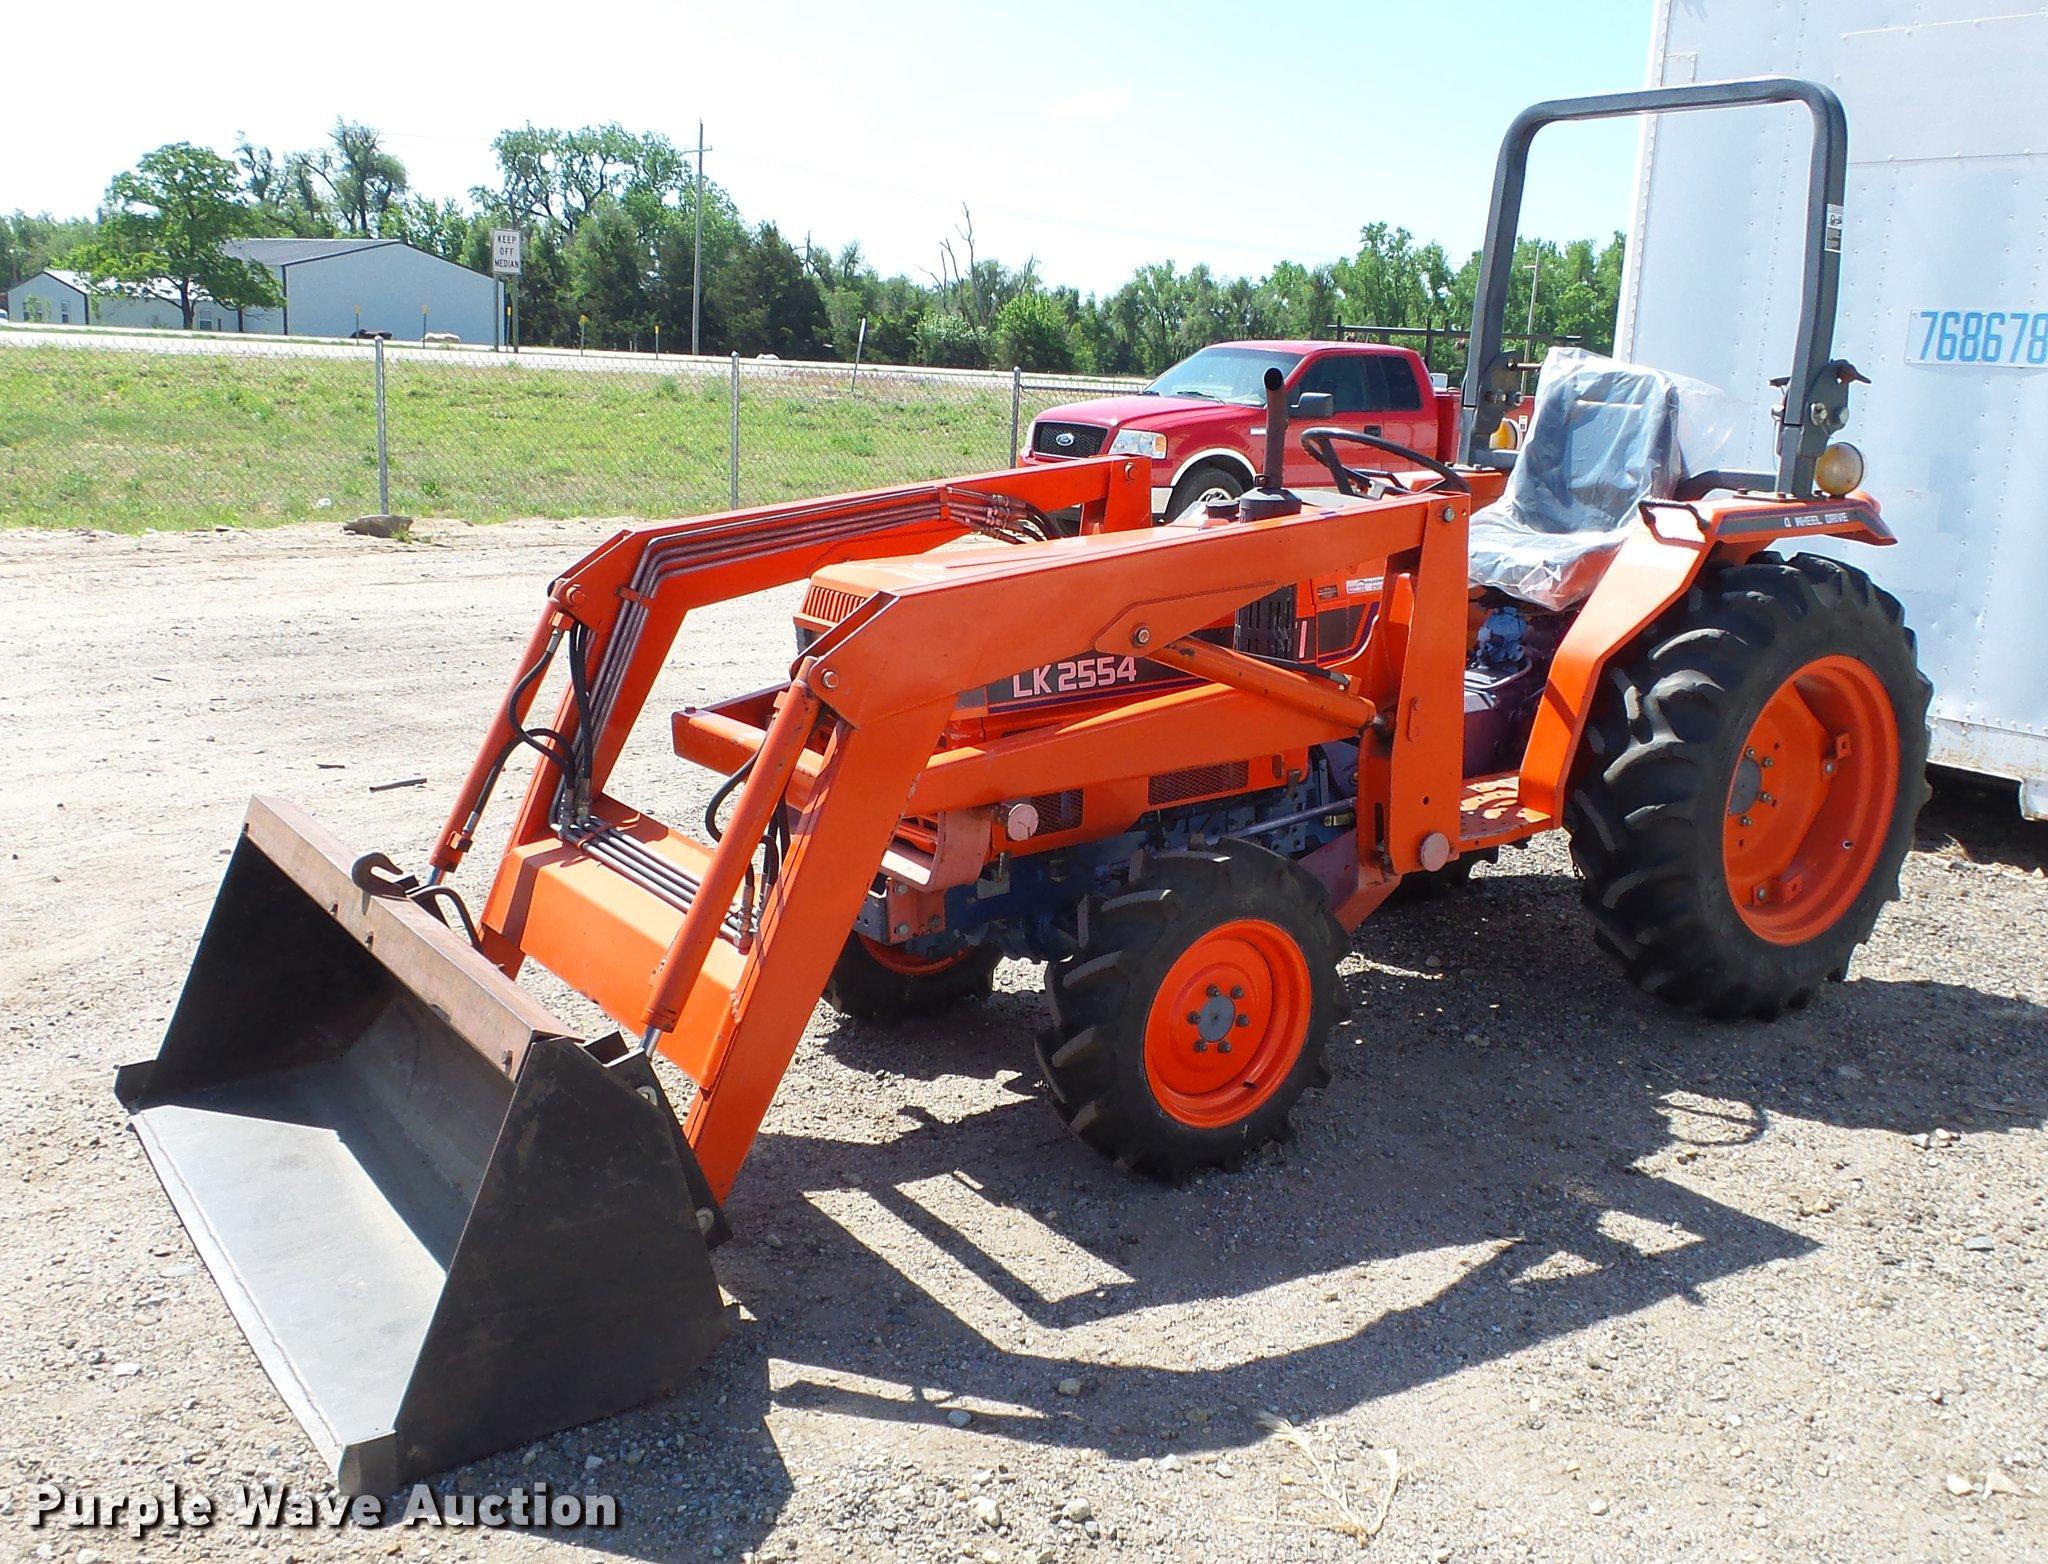 Kioti LK2554 MFWD tractor | Item ET9517 | SOLD! June 13 Vehi